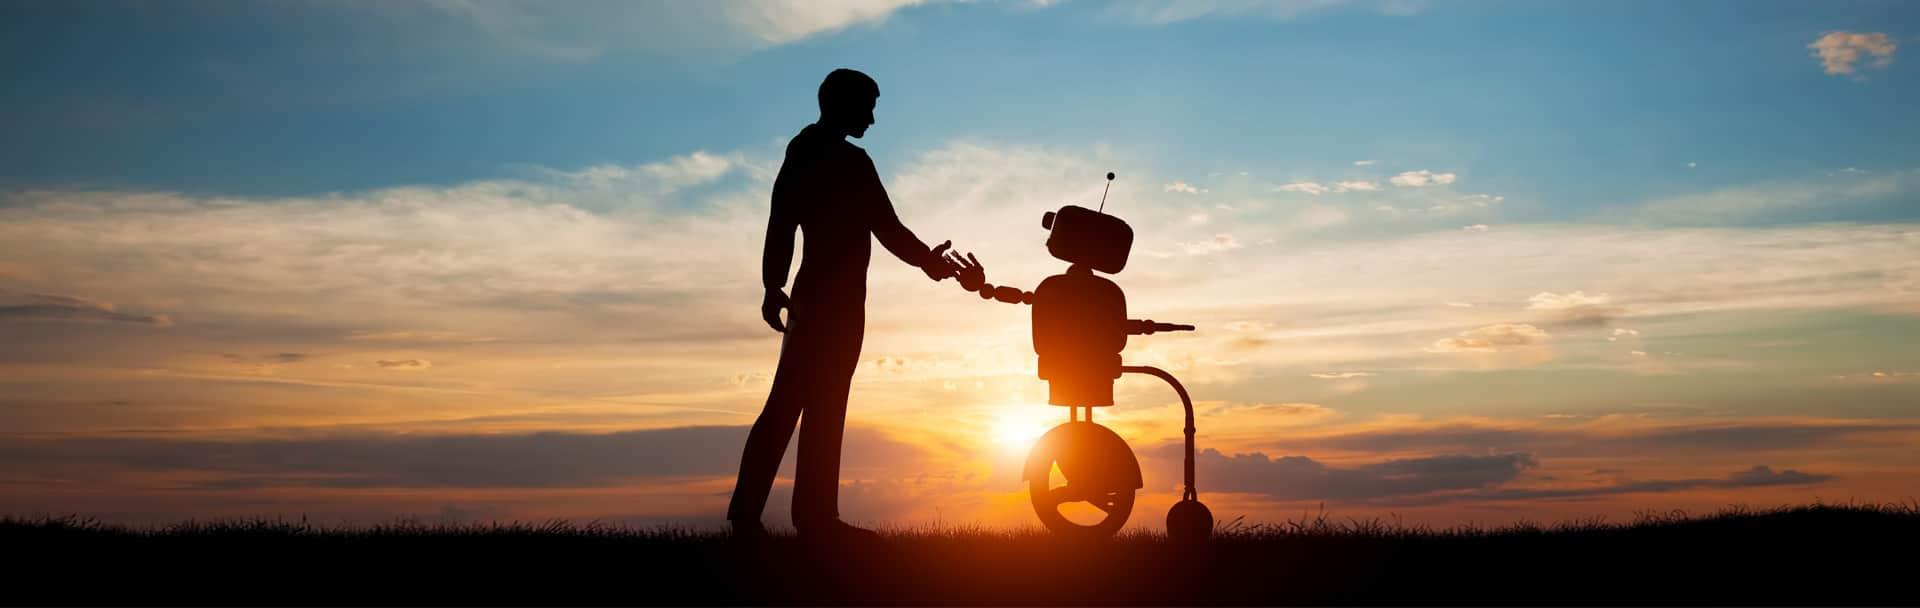 Blog: De evolutie van Business Intelligence tot Artificial Intelligence - Hot ITem